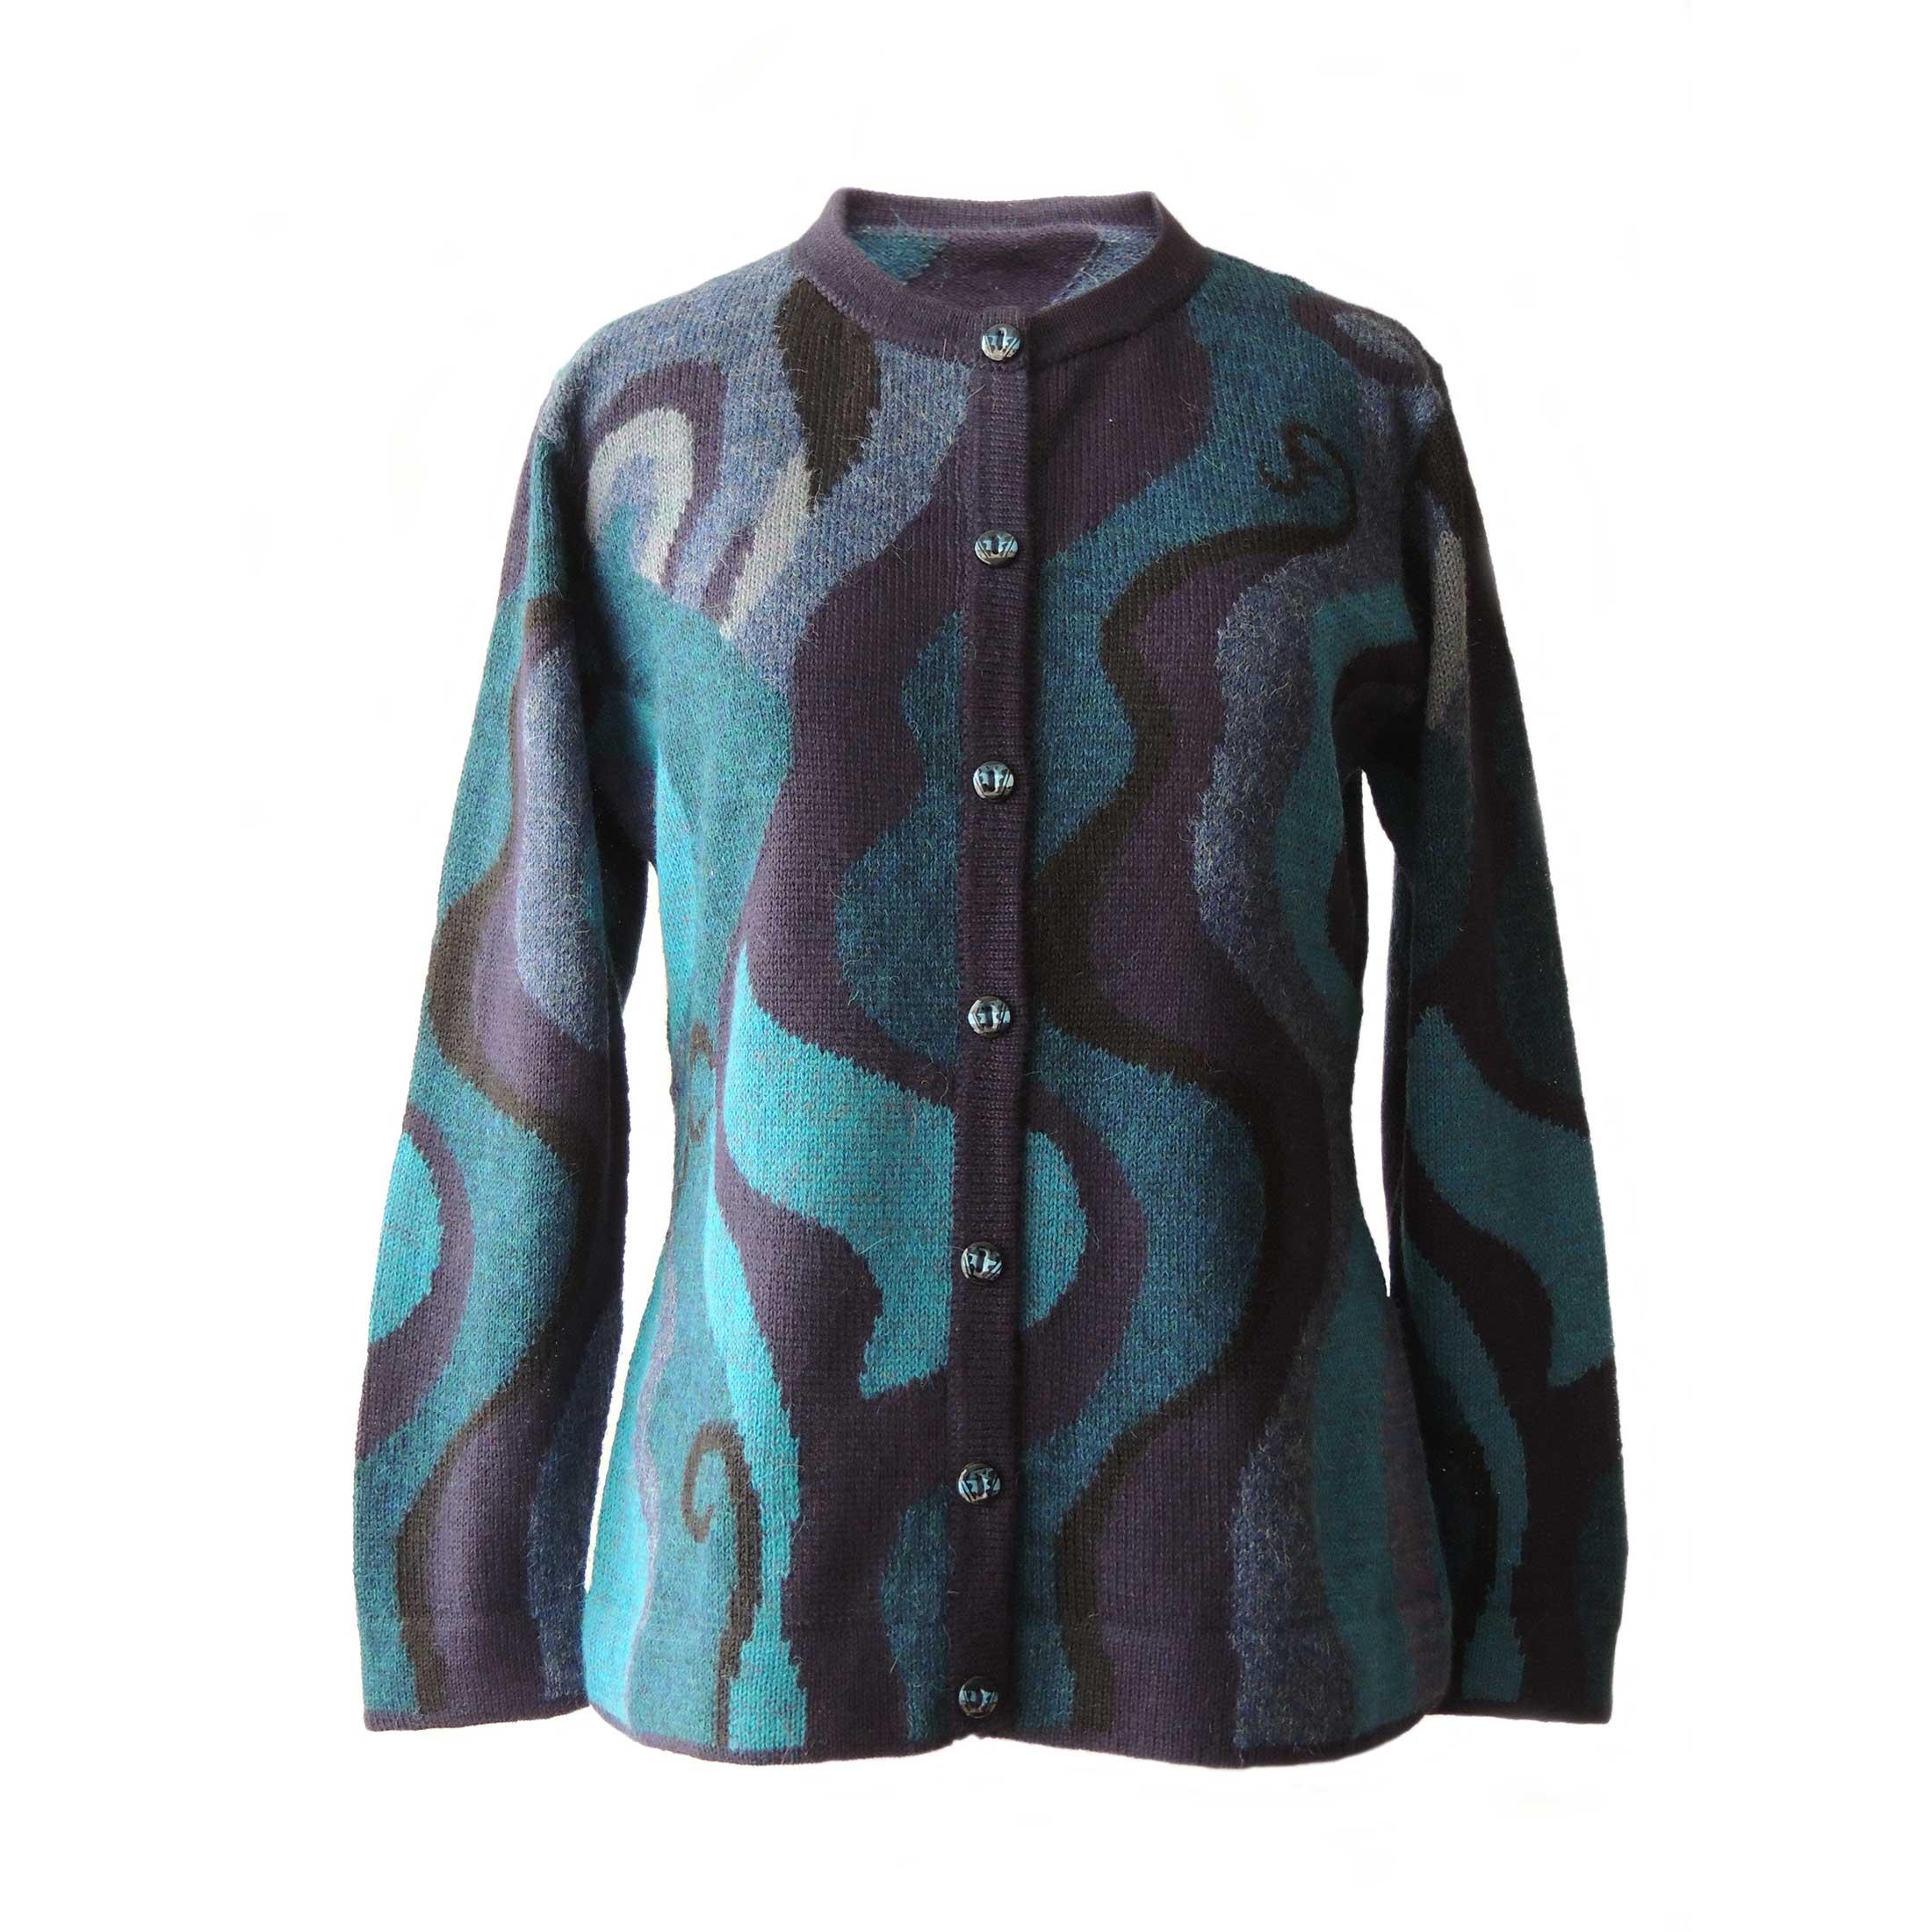 PopsFL knitwear wholesale Women sweater with all over